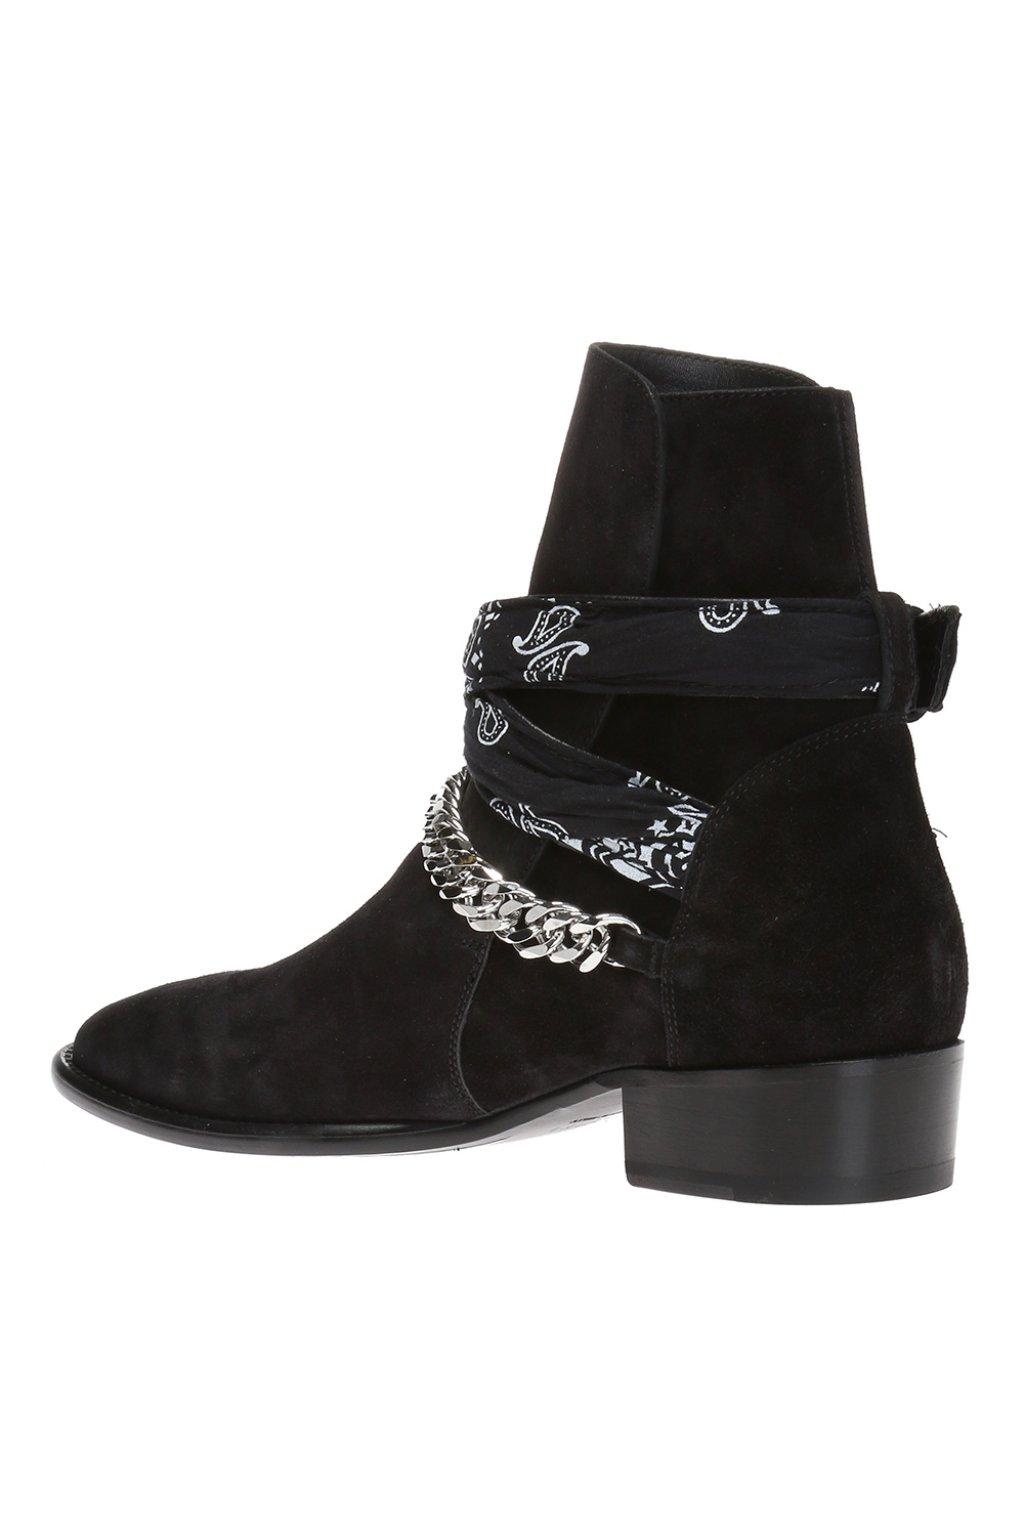 Amiri Bandana-strap ankle boots